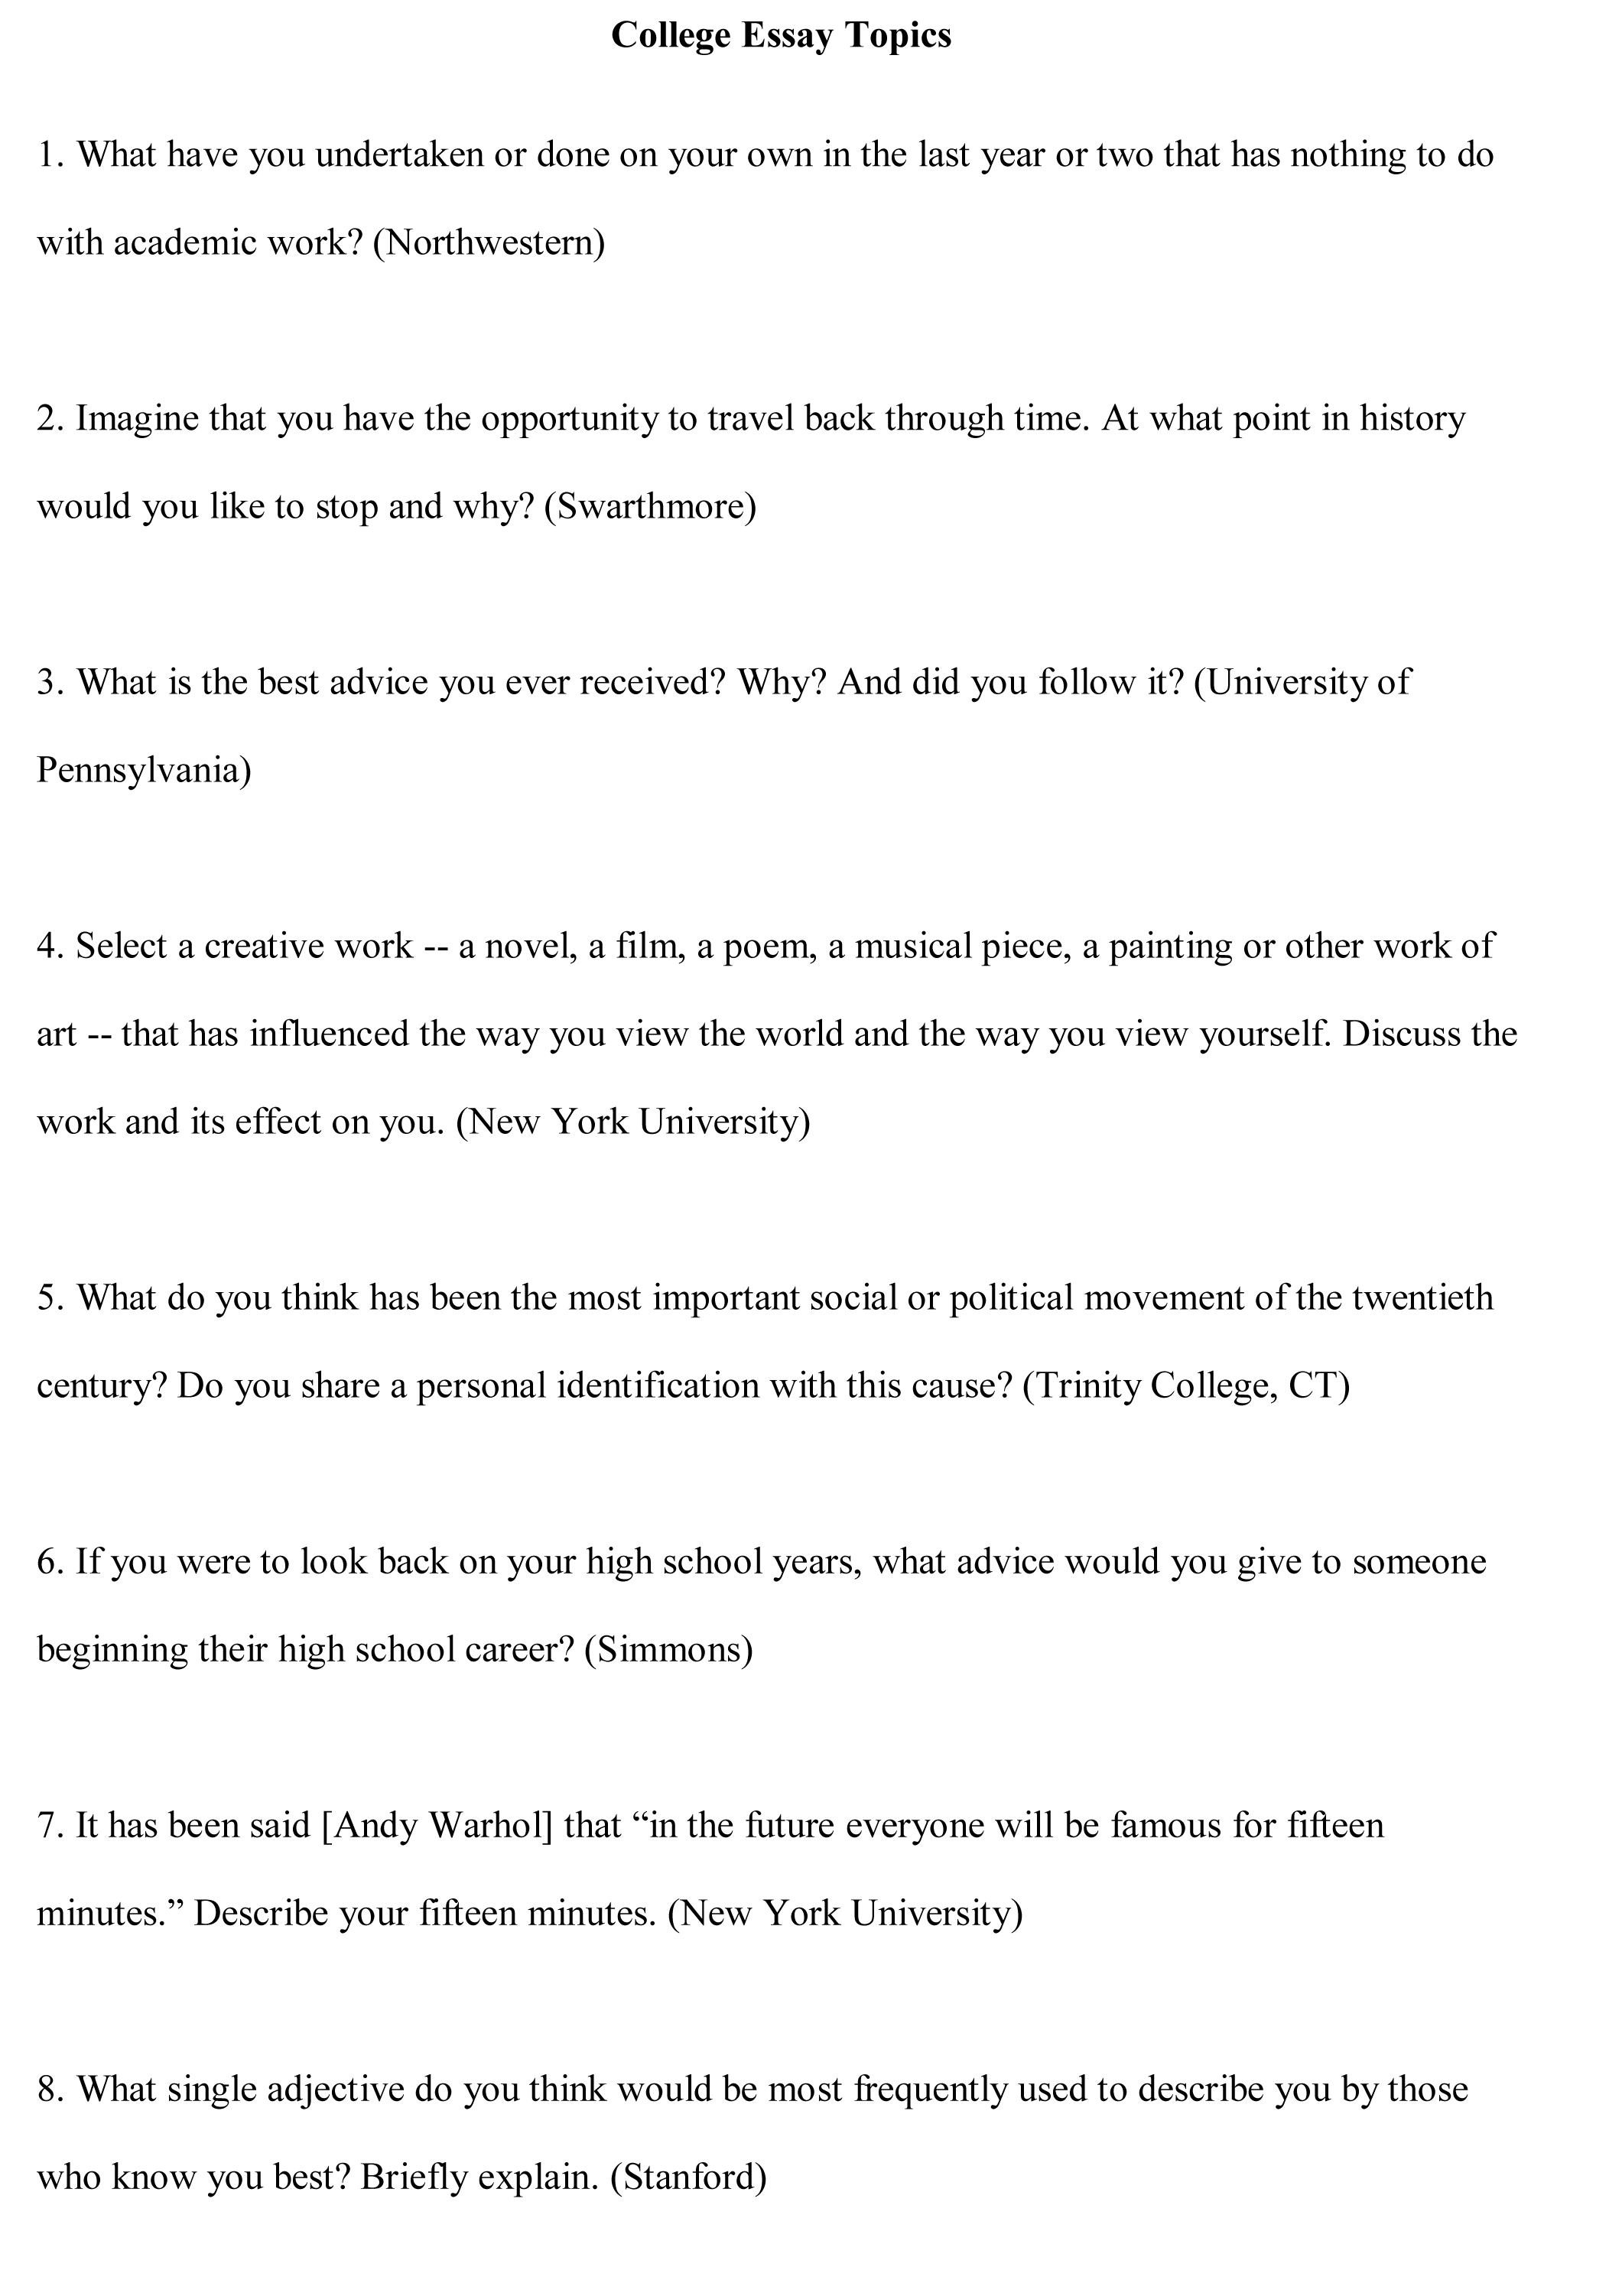 001 College Essay Topics Free Sample1 Example Marvelous Creative List Interesting 2018 Full